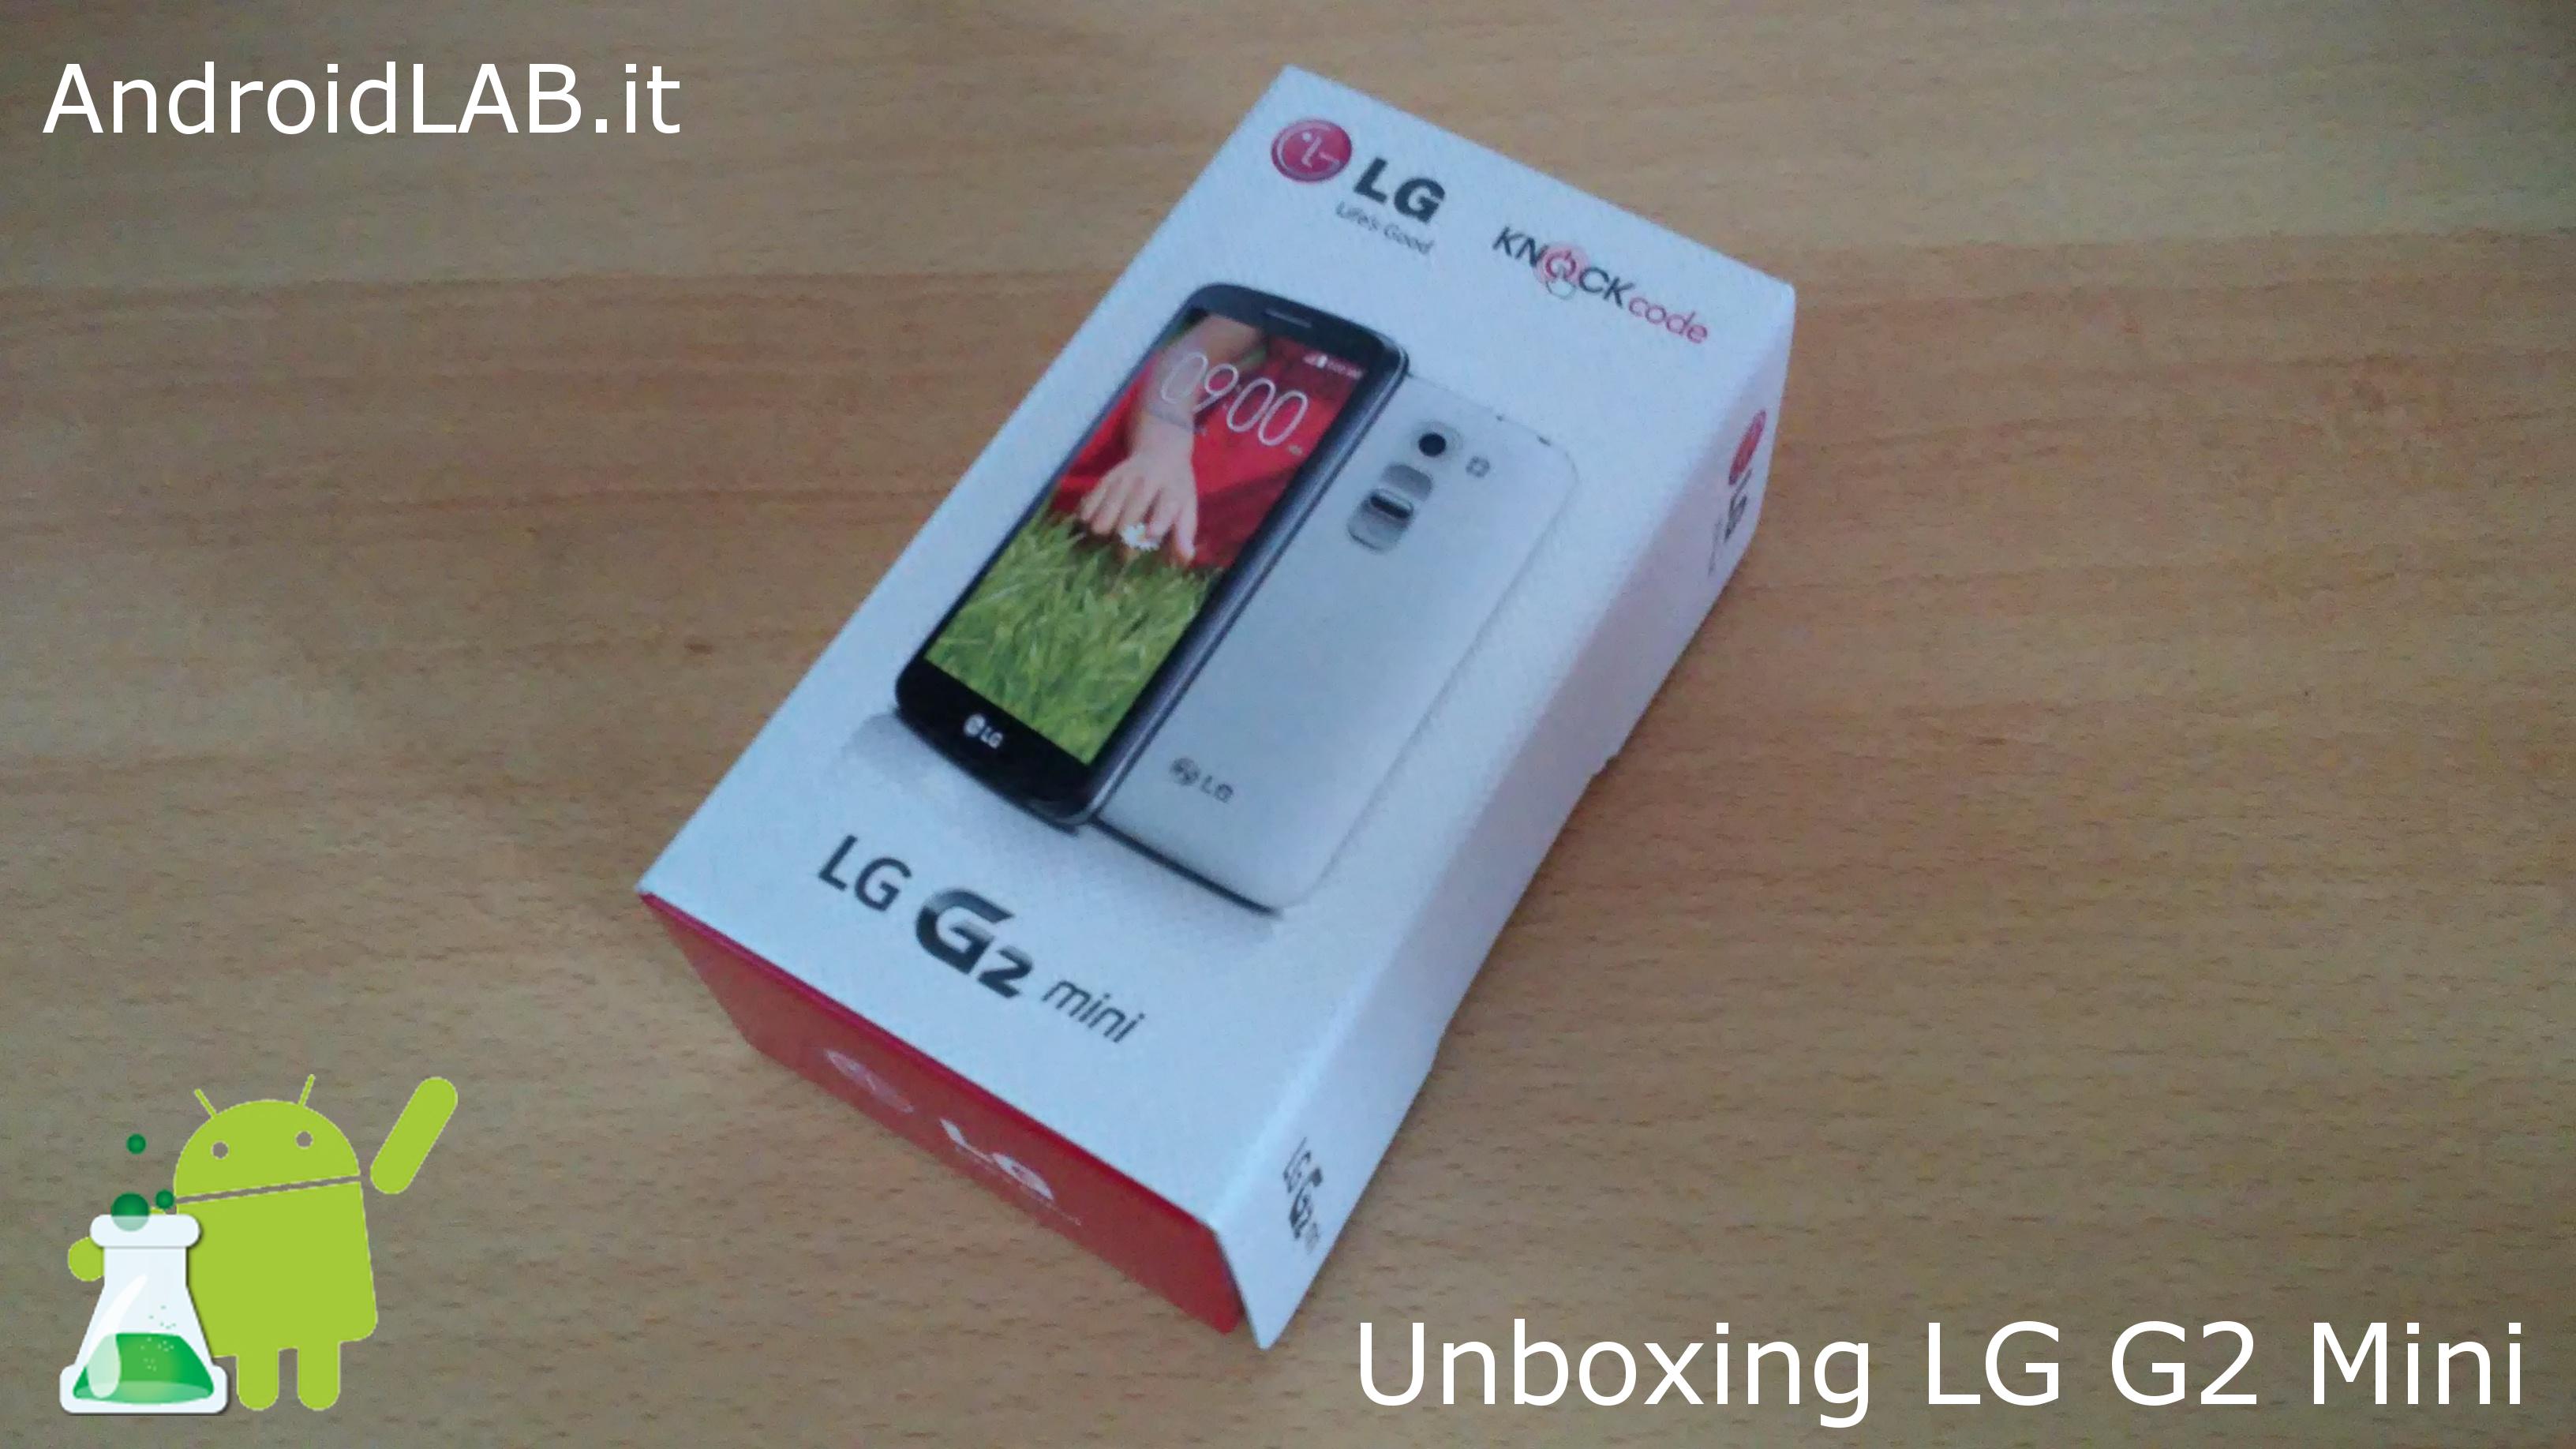 unboxinglgg2mini